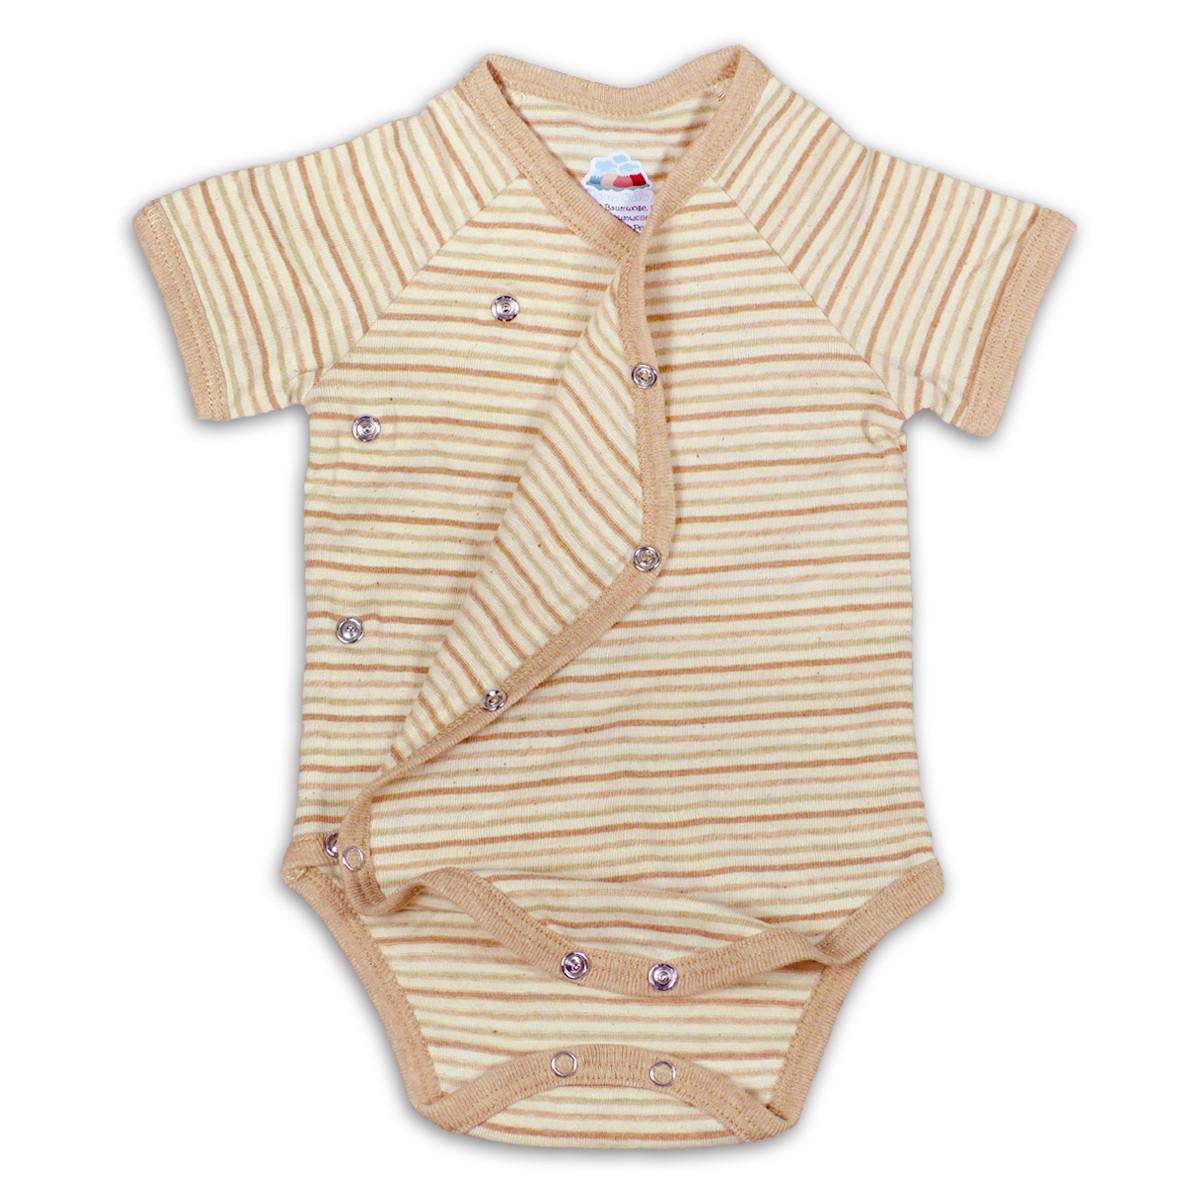 Chill n Feel - Kurzarm-Kimono Baby Body aus Pima Bio-Baumwolle Gestreift (1)